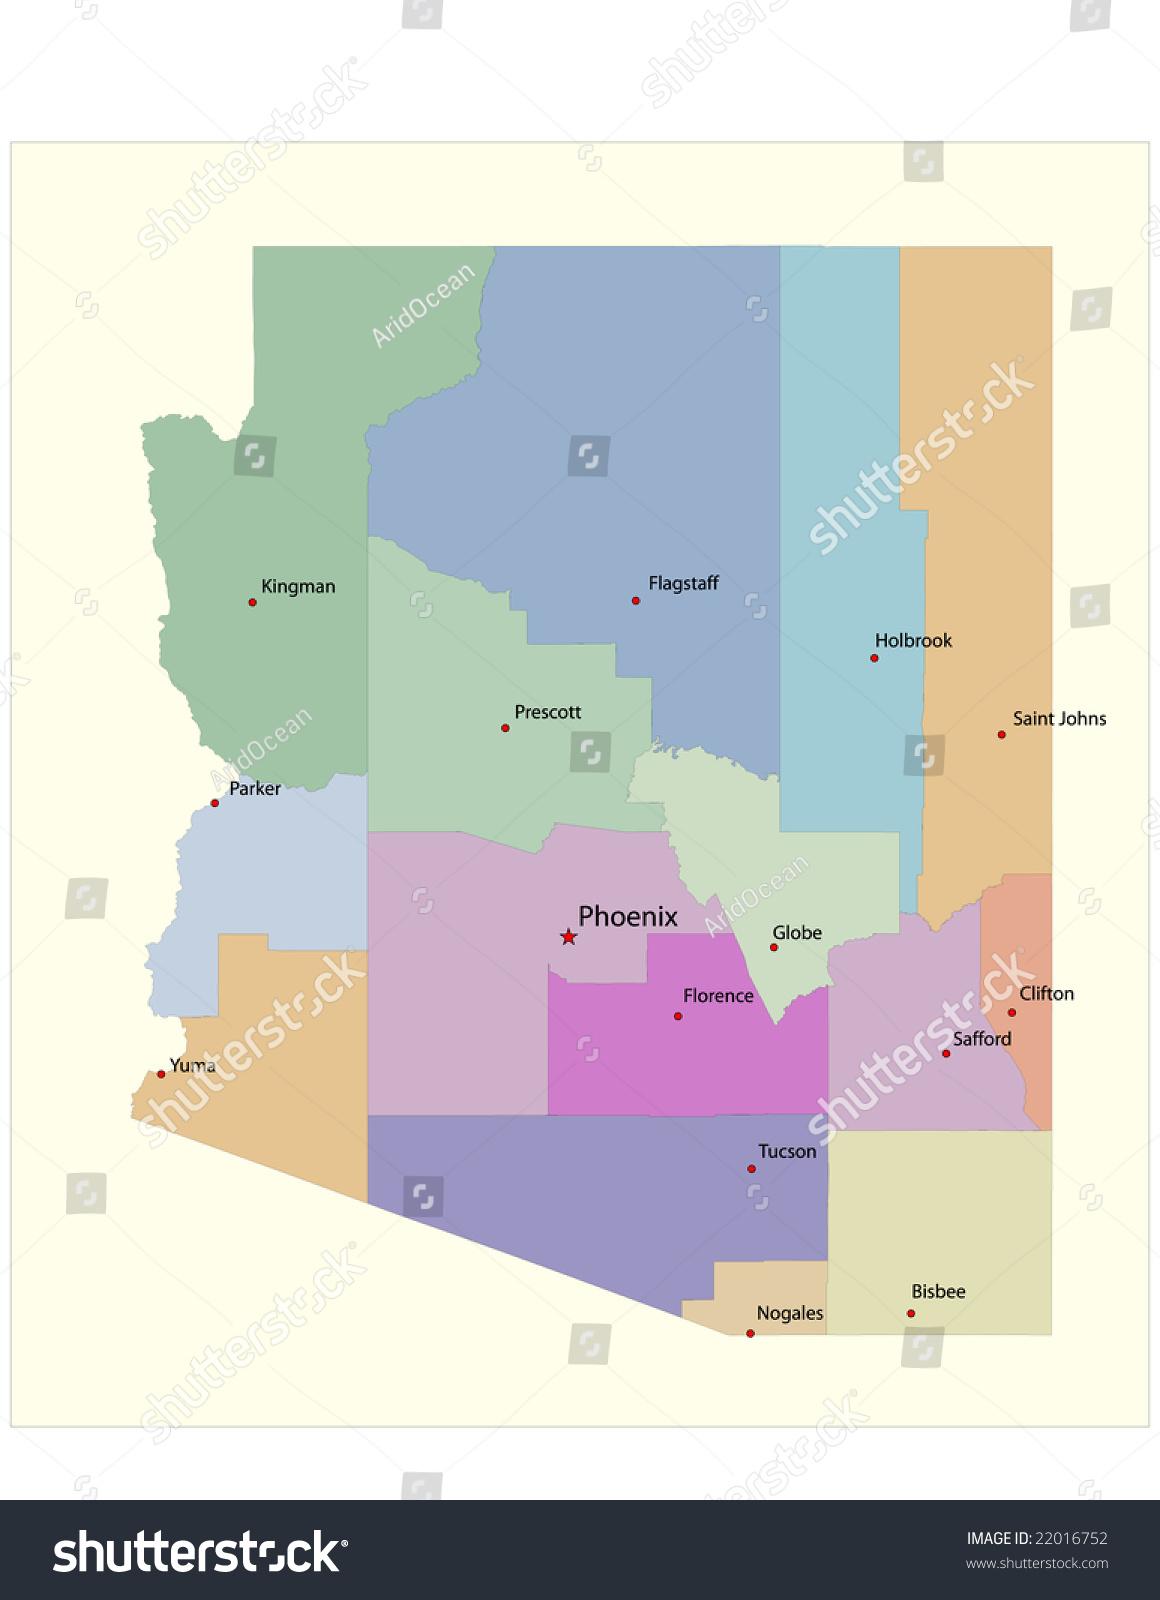 az county map state and county maps of arizona az county arizona